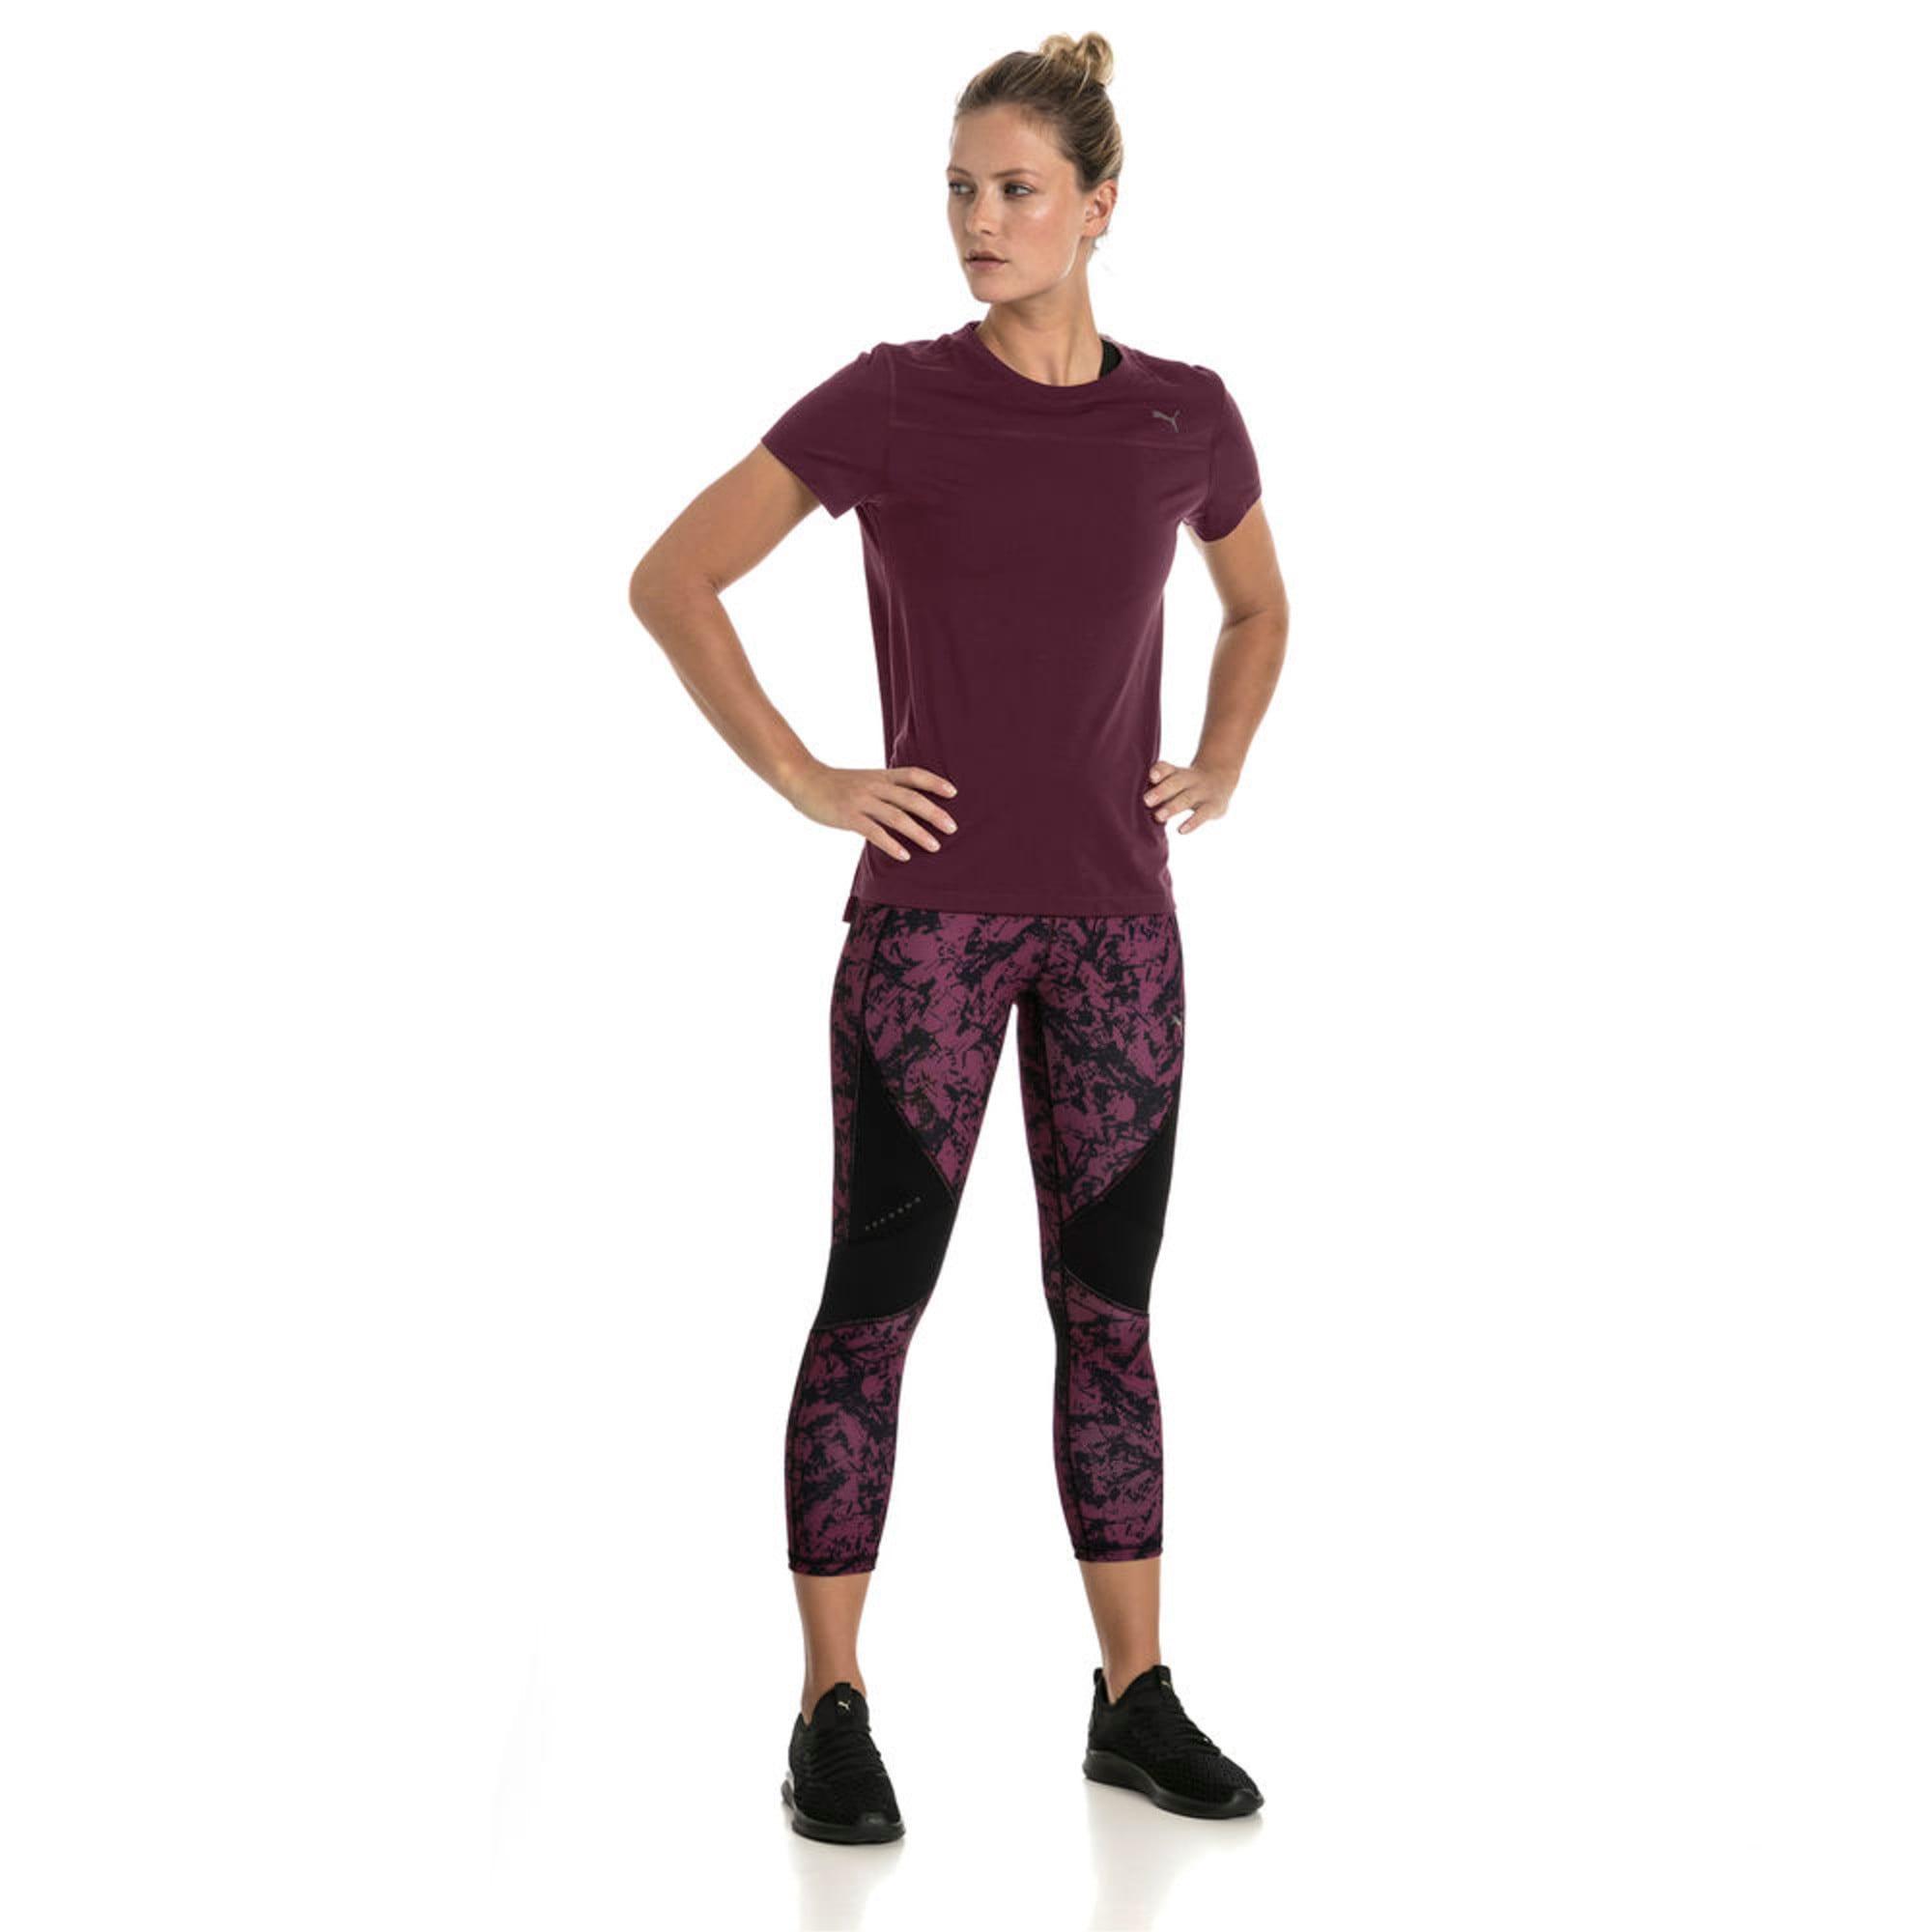 Thumbnail 3 of IGNITE Graphic Women's Running 3/4 Tights, Puma Black-Fig, medium-IND